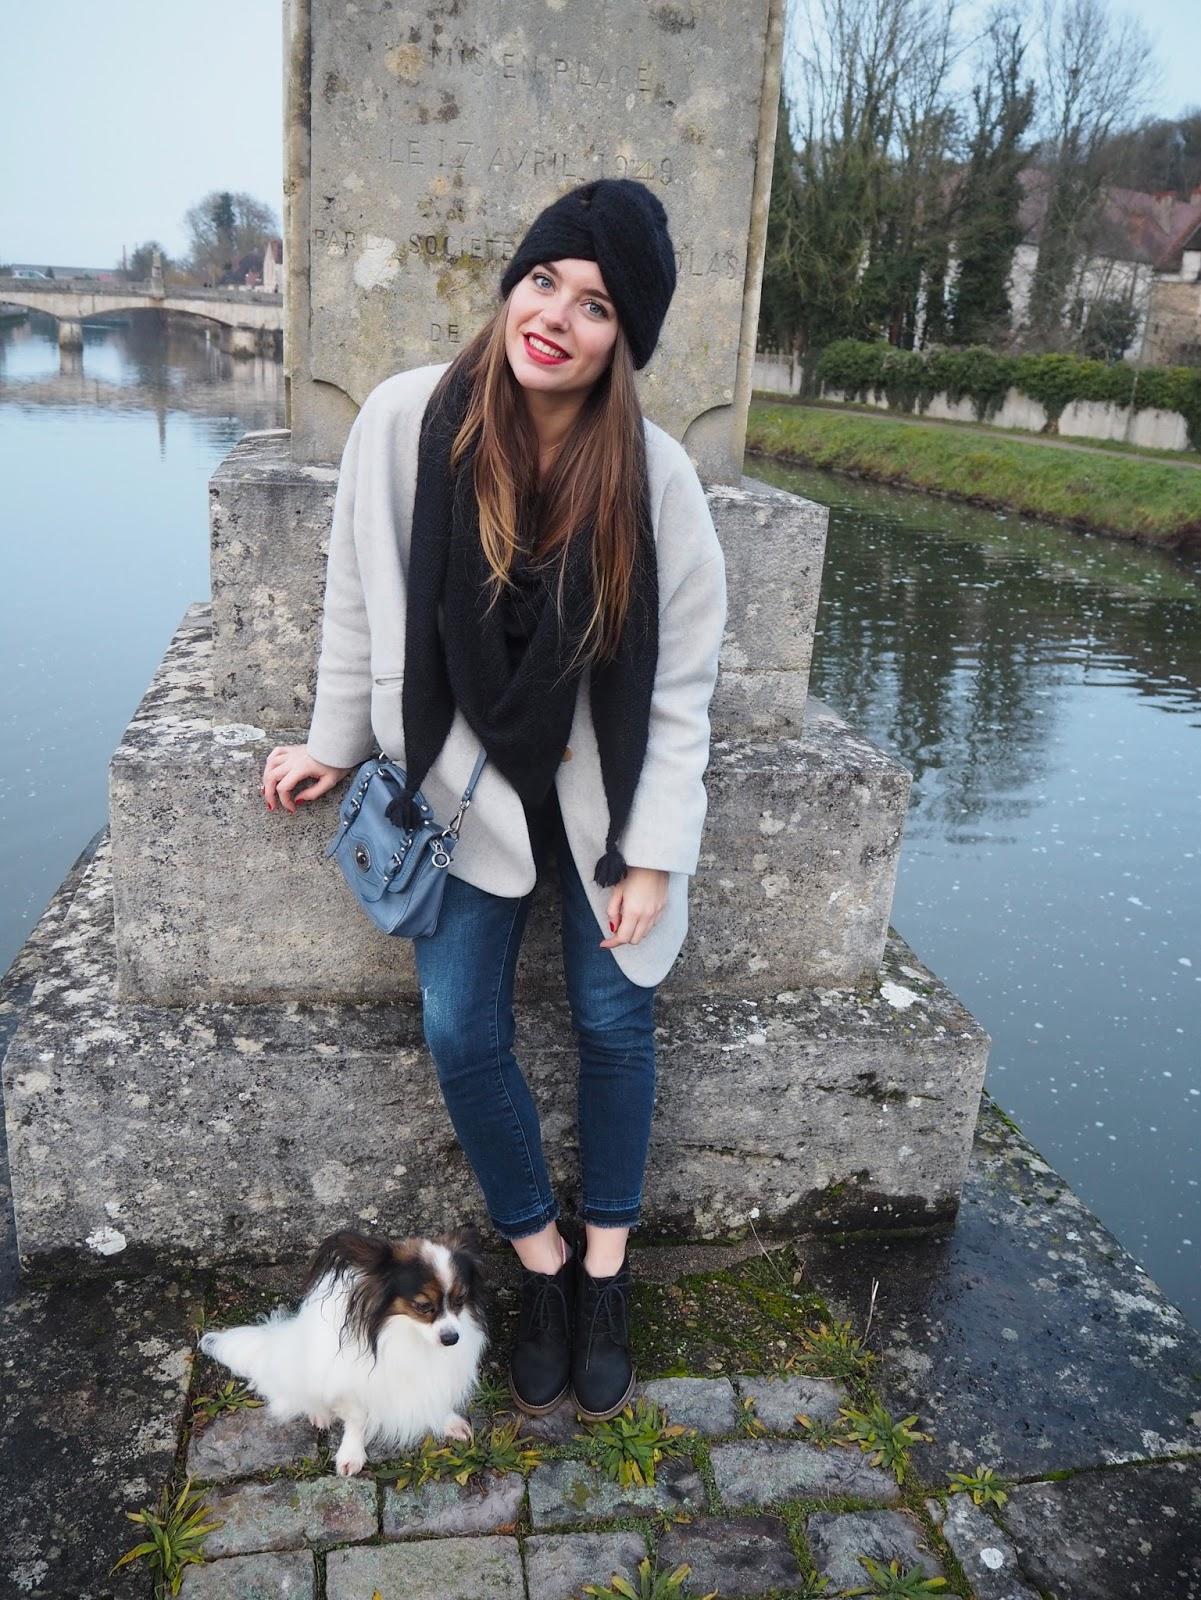 blogueuse mode des petits hauts